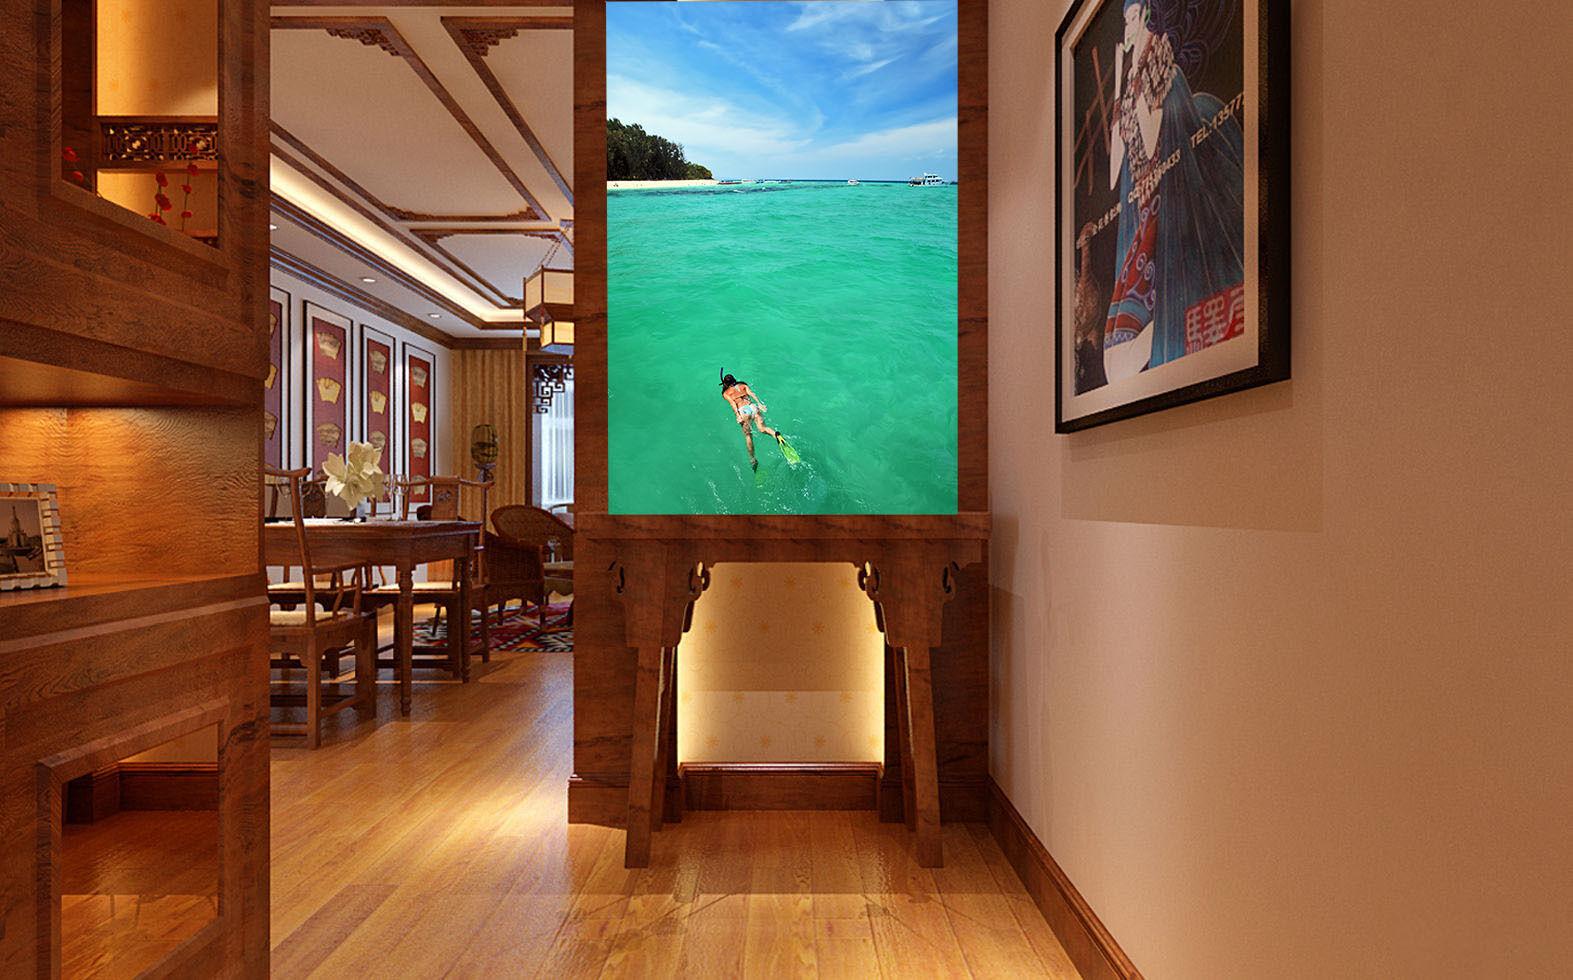 3D Immersione 5 Parete Murale Foto Carta da parati immagine sfondo muro stampa